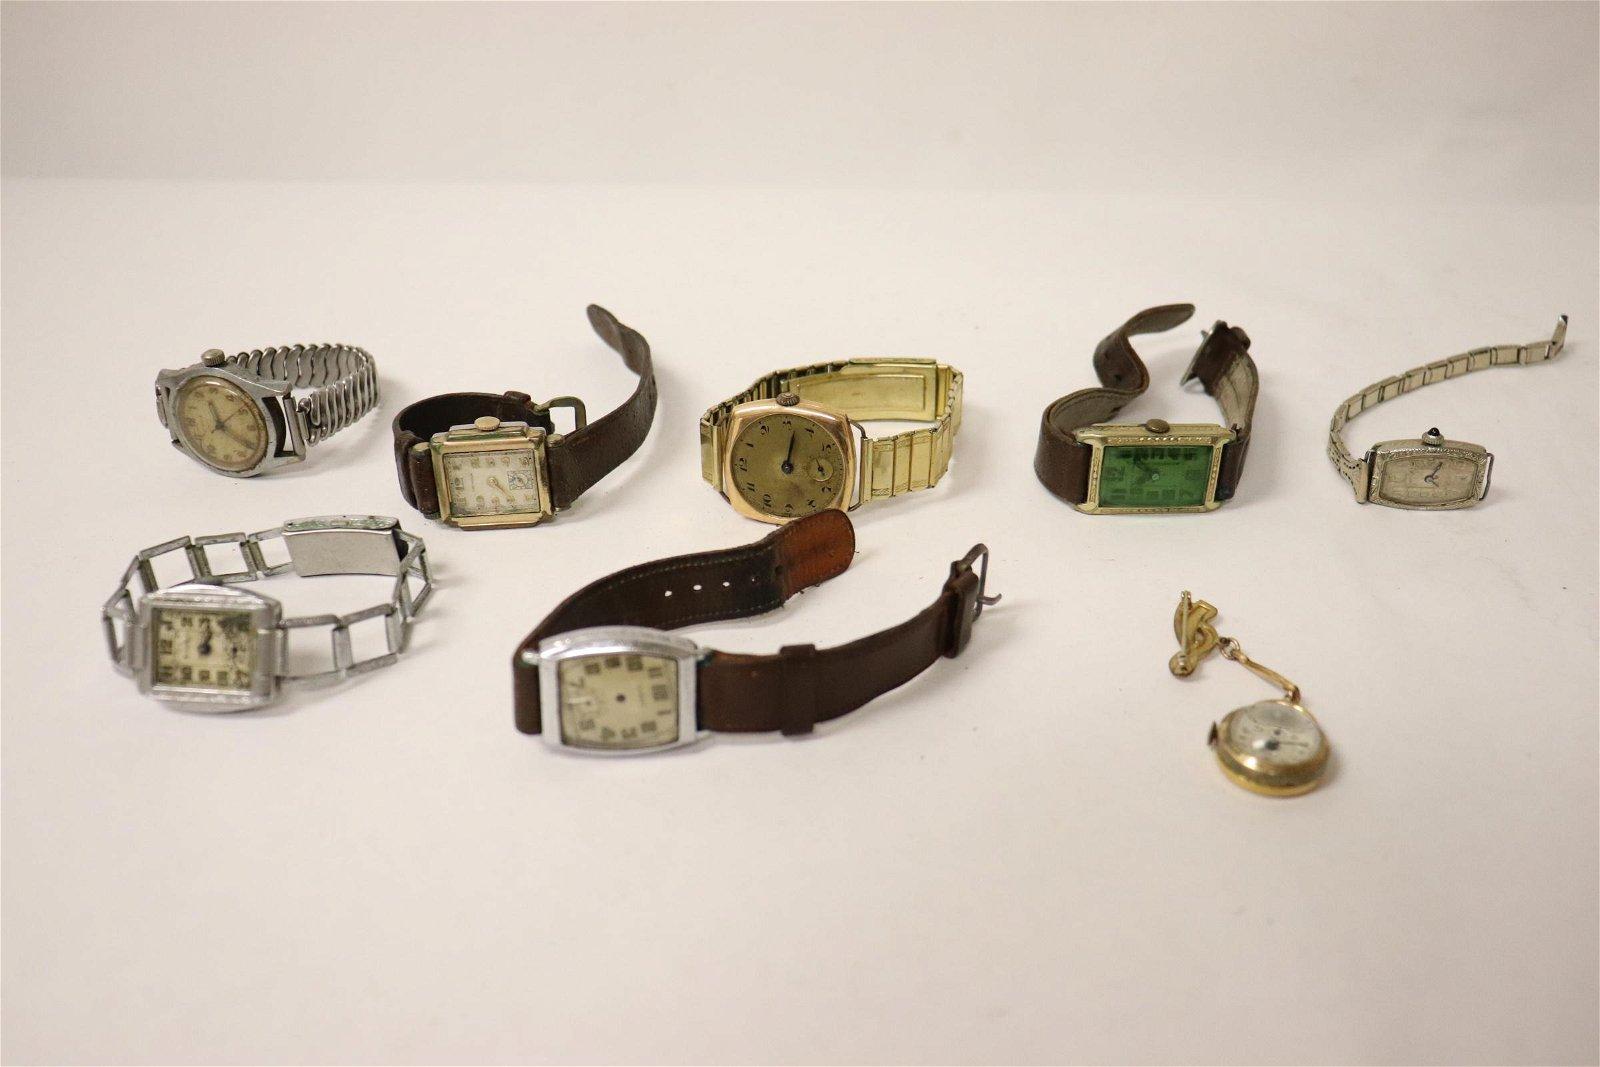 8 vintage watches